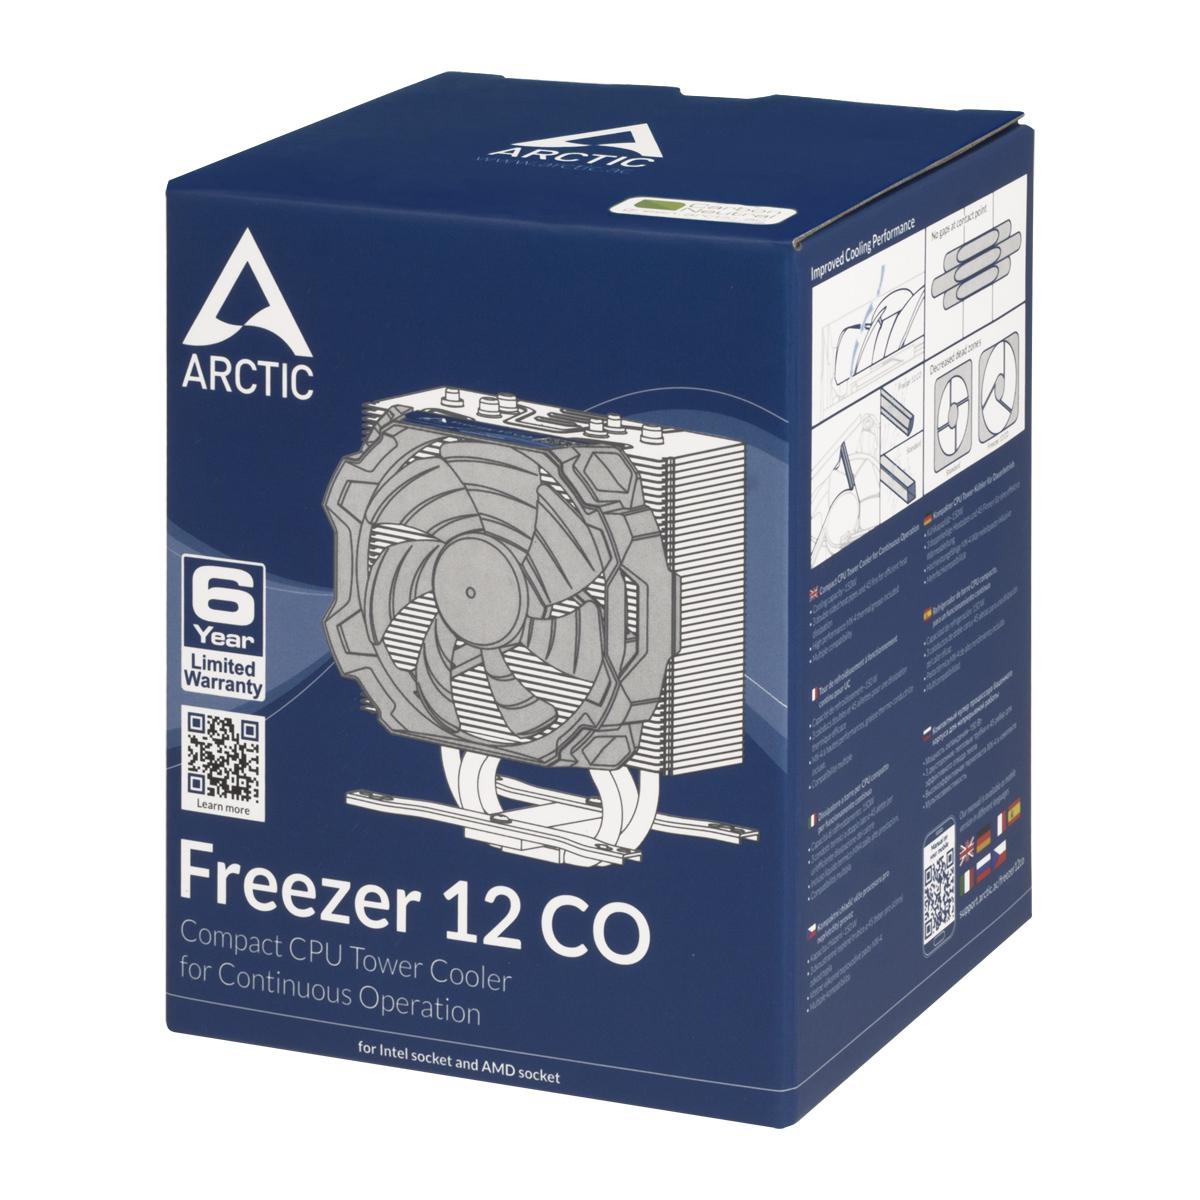 Freezer 12 CO